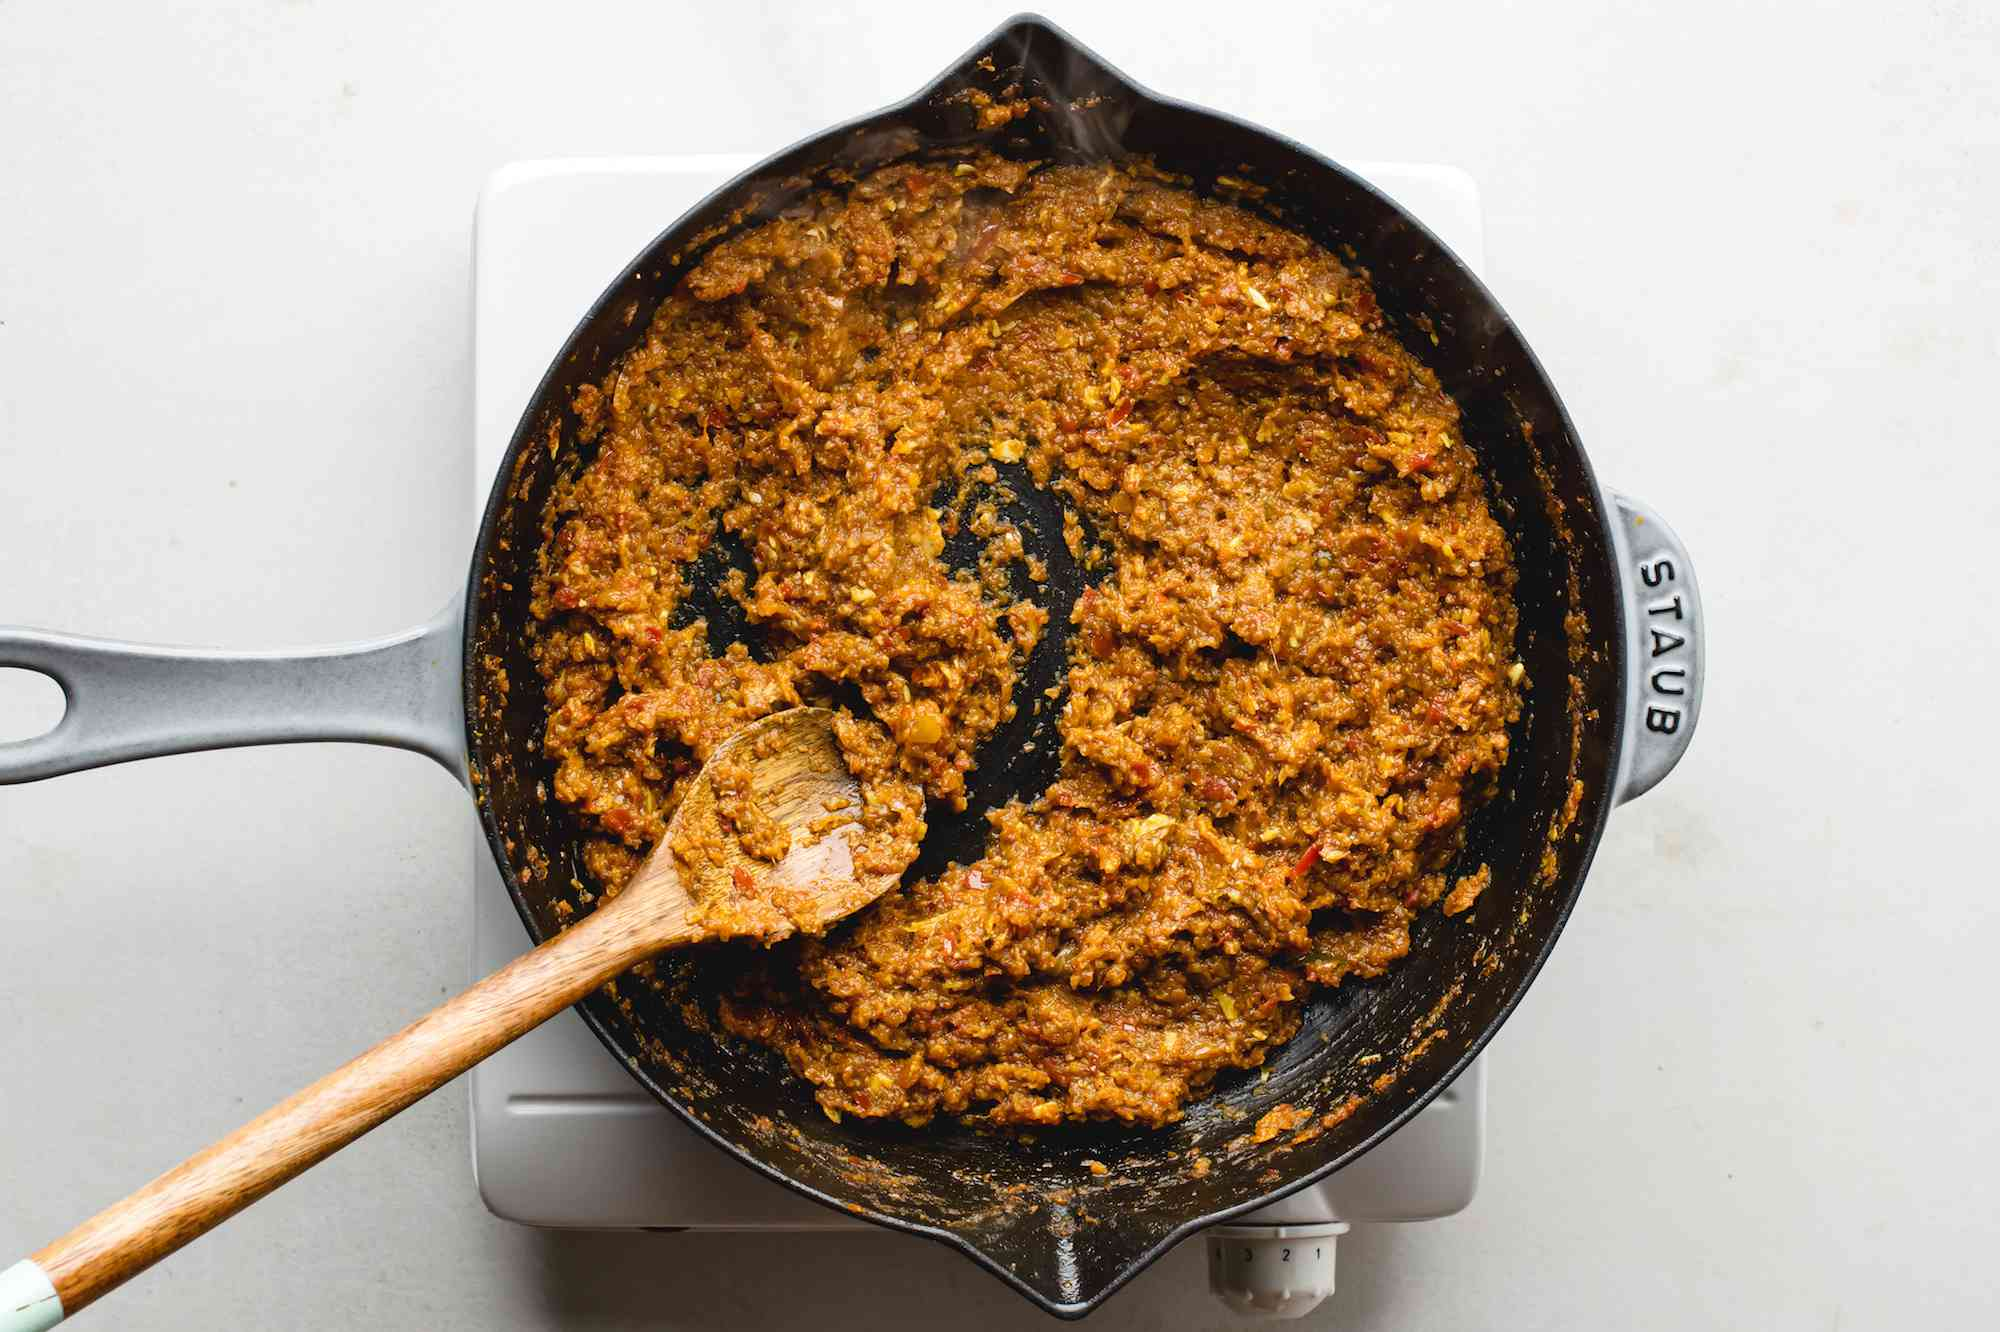 Sauce mixture cooking in a pan